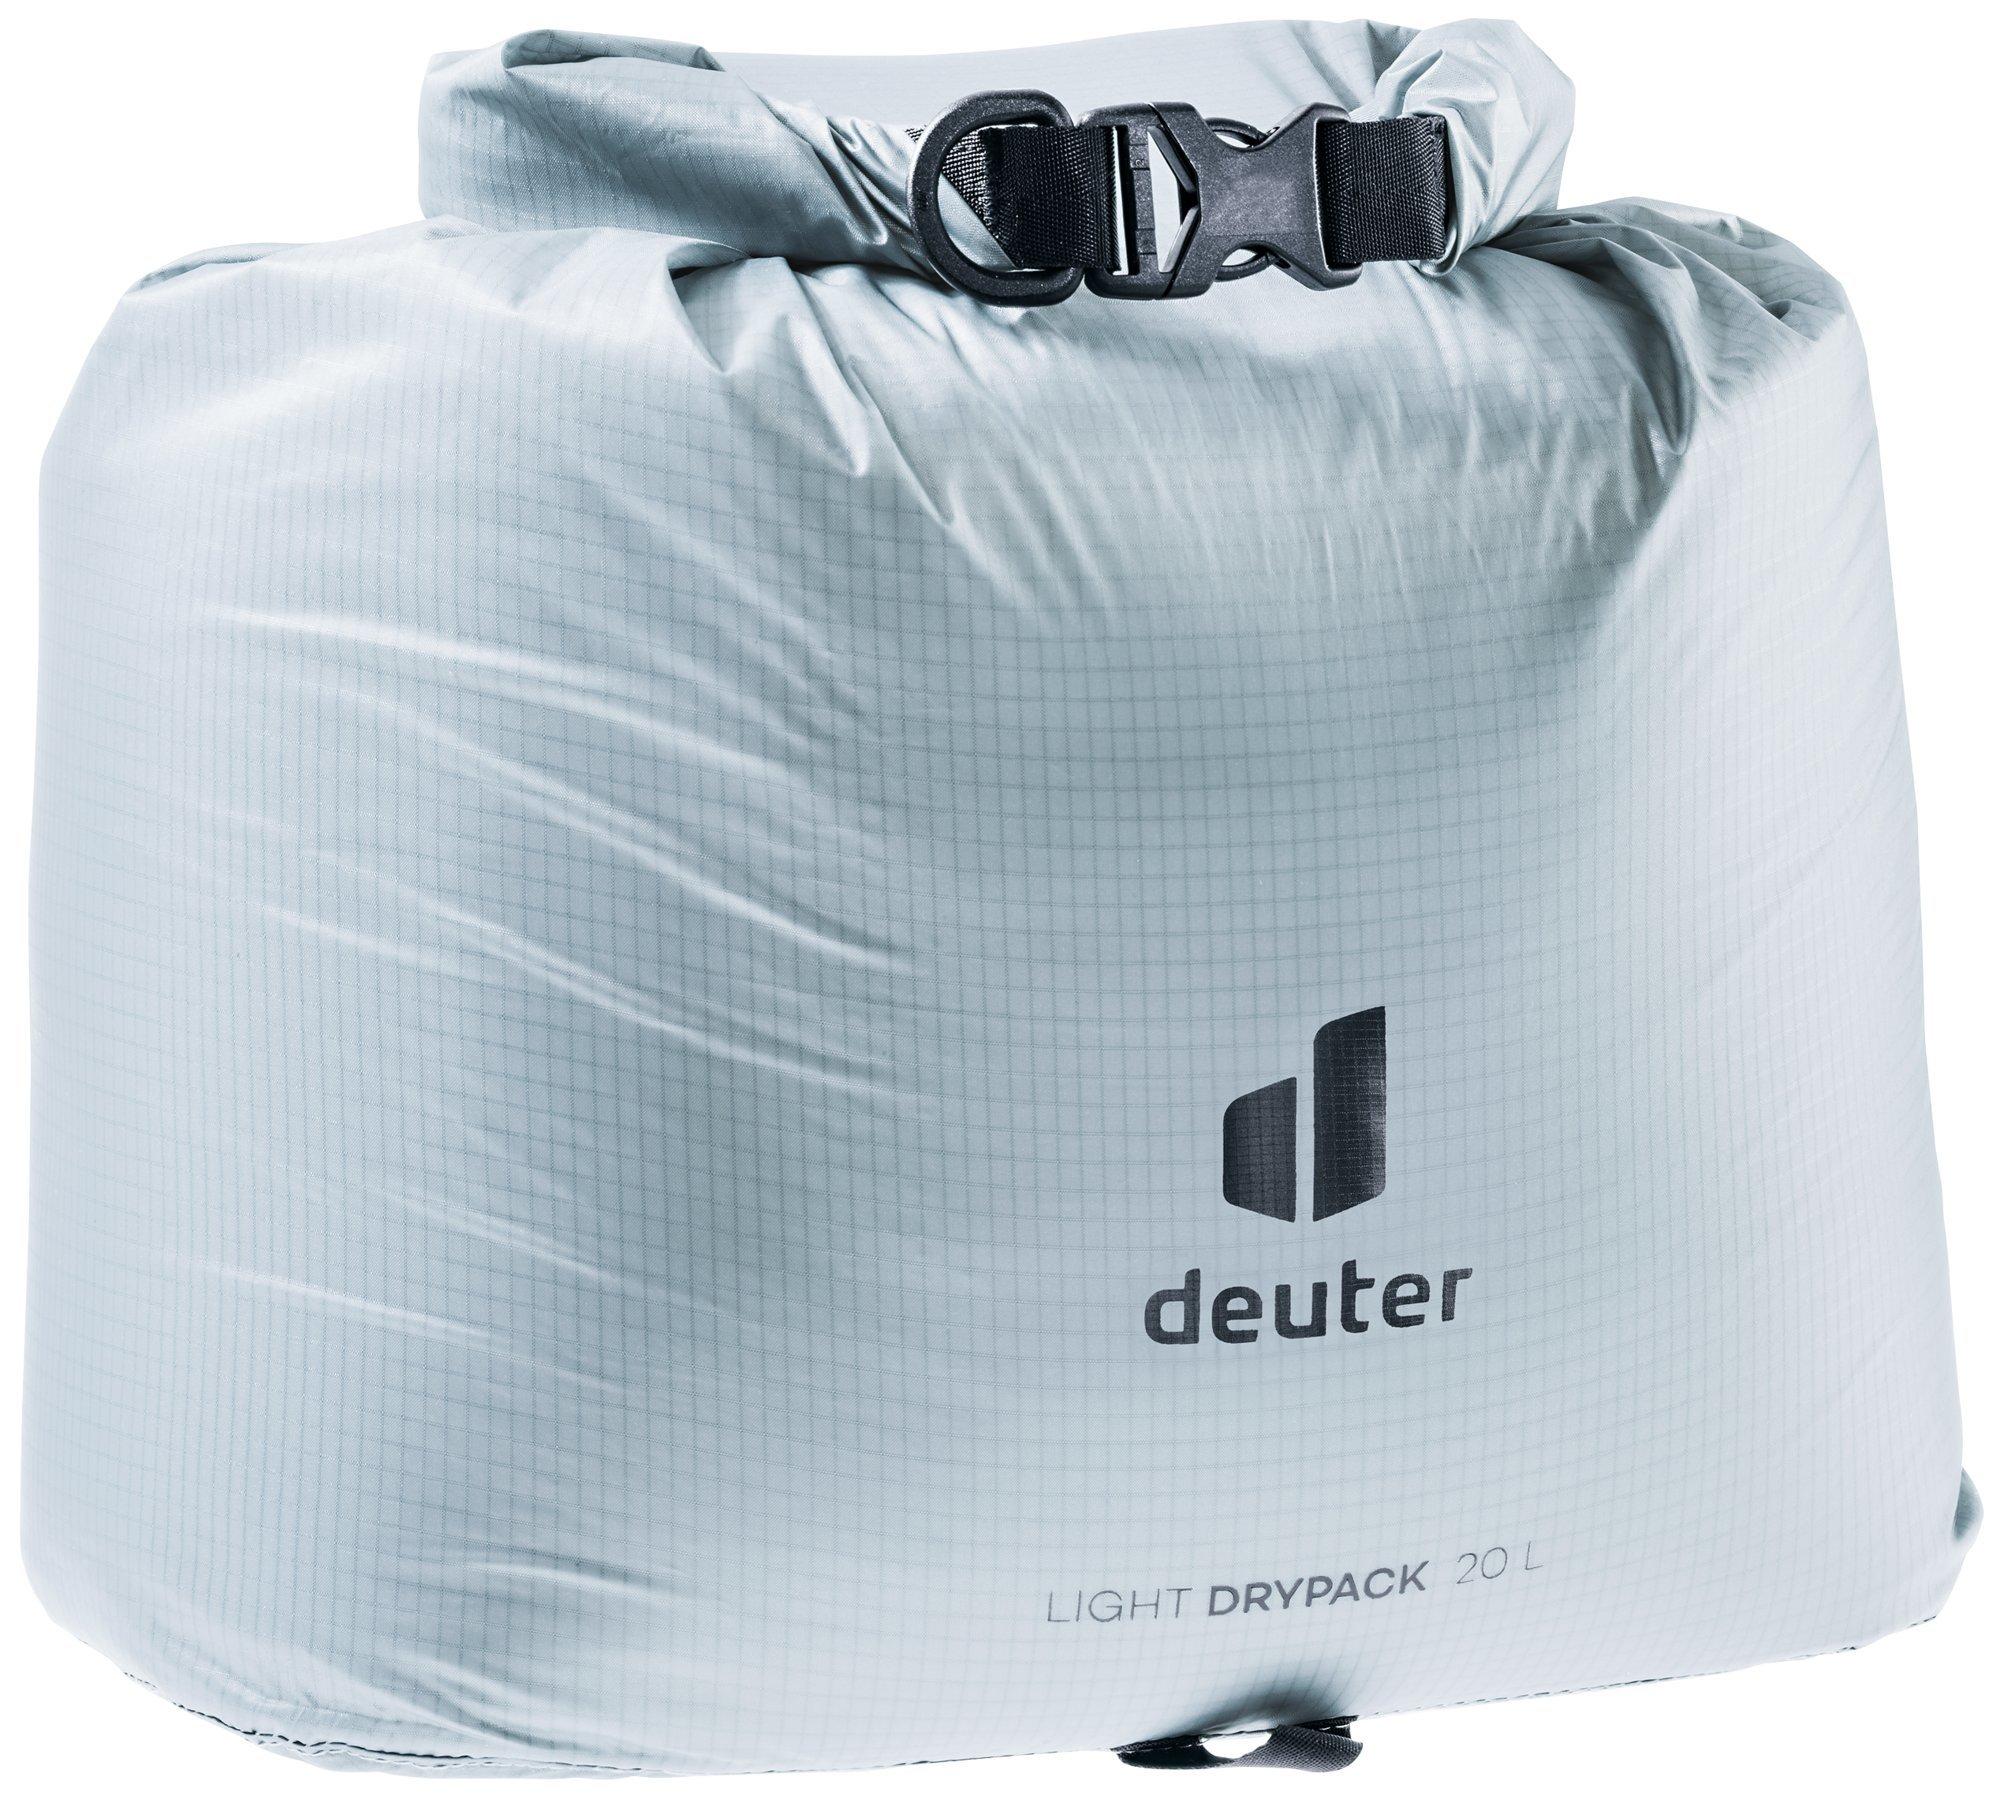 Новинки Гермомешок Deuter Light Drypack 20 (2021) 3940421-4012-LightDrypack20-w20-d0.jpg